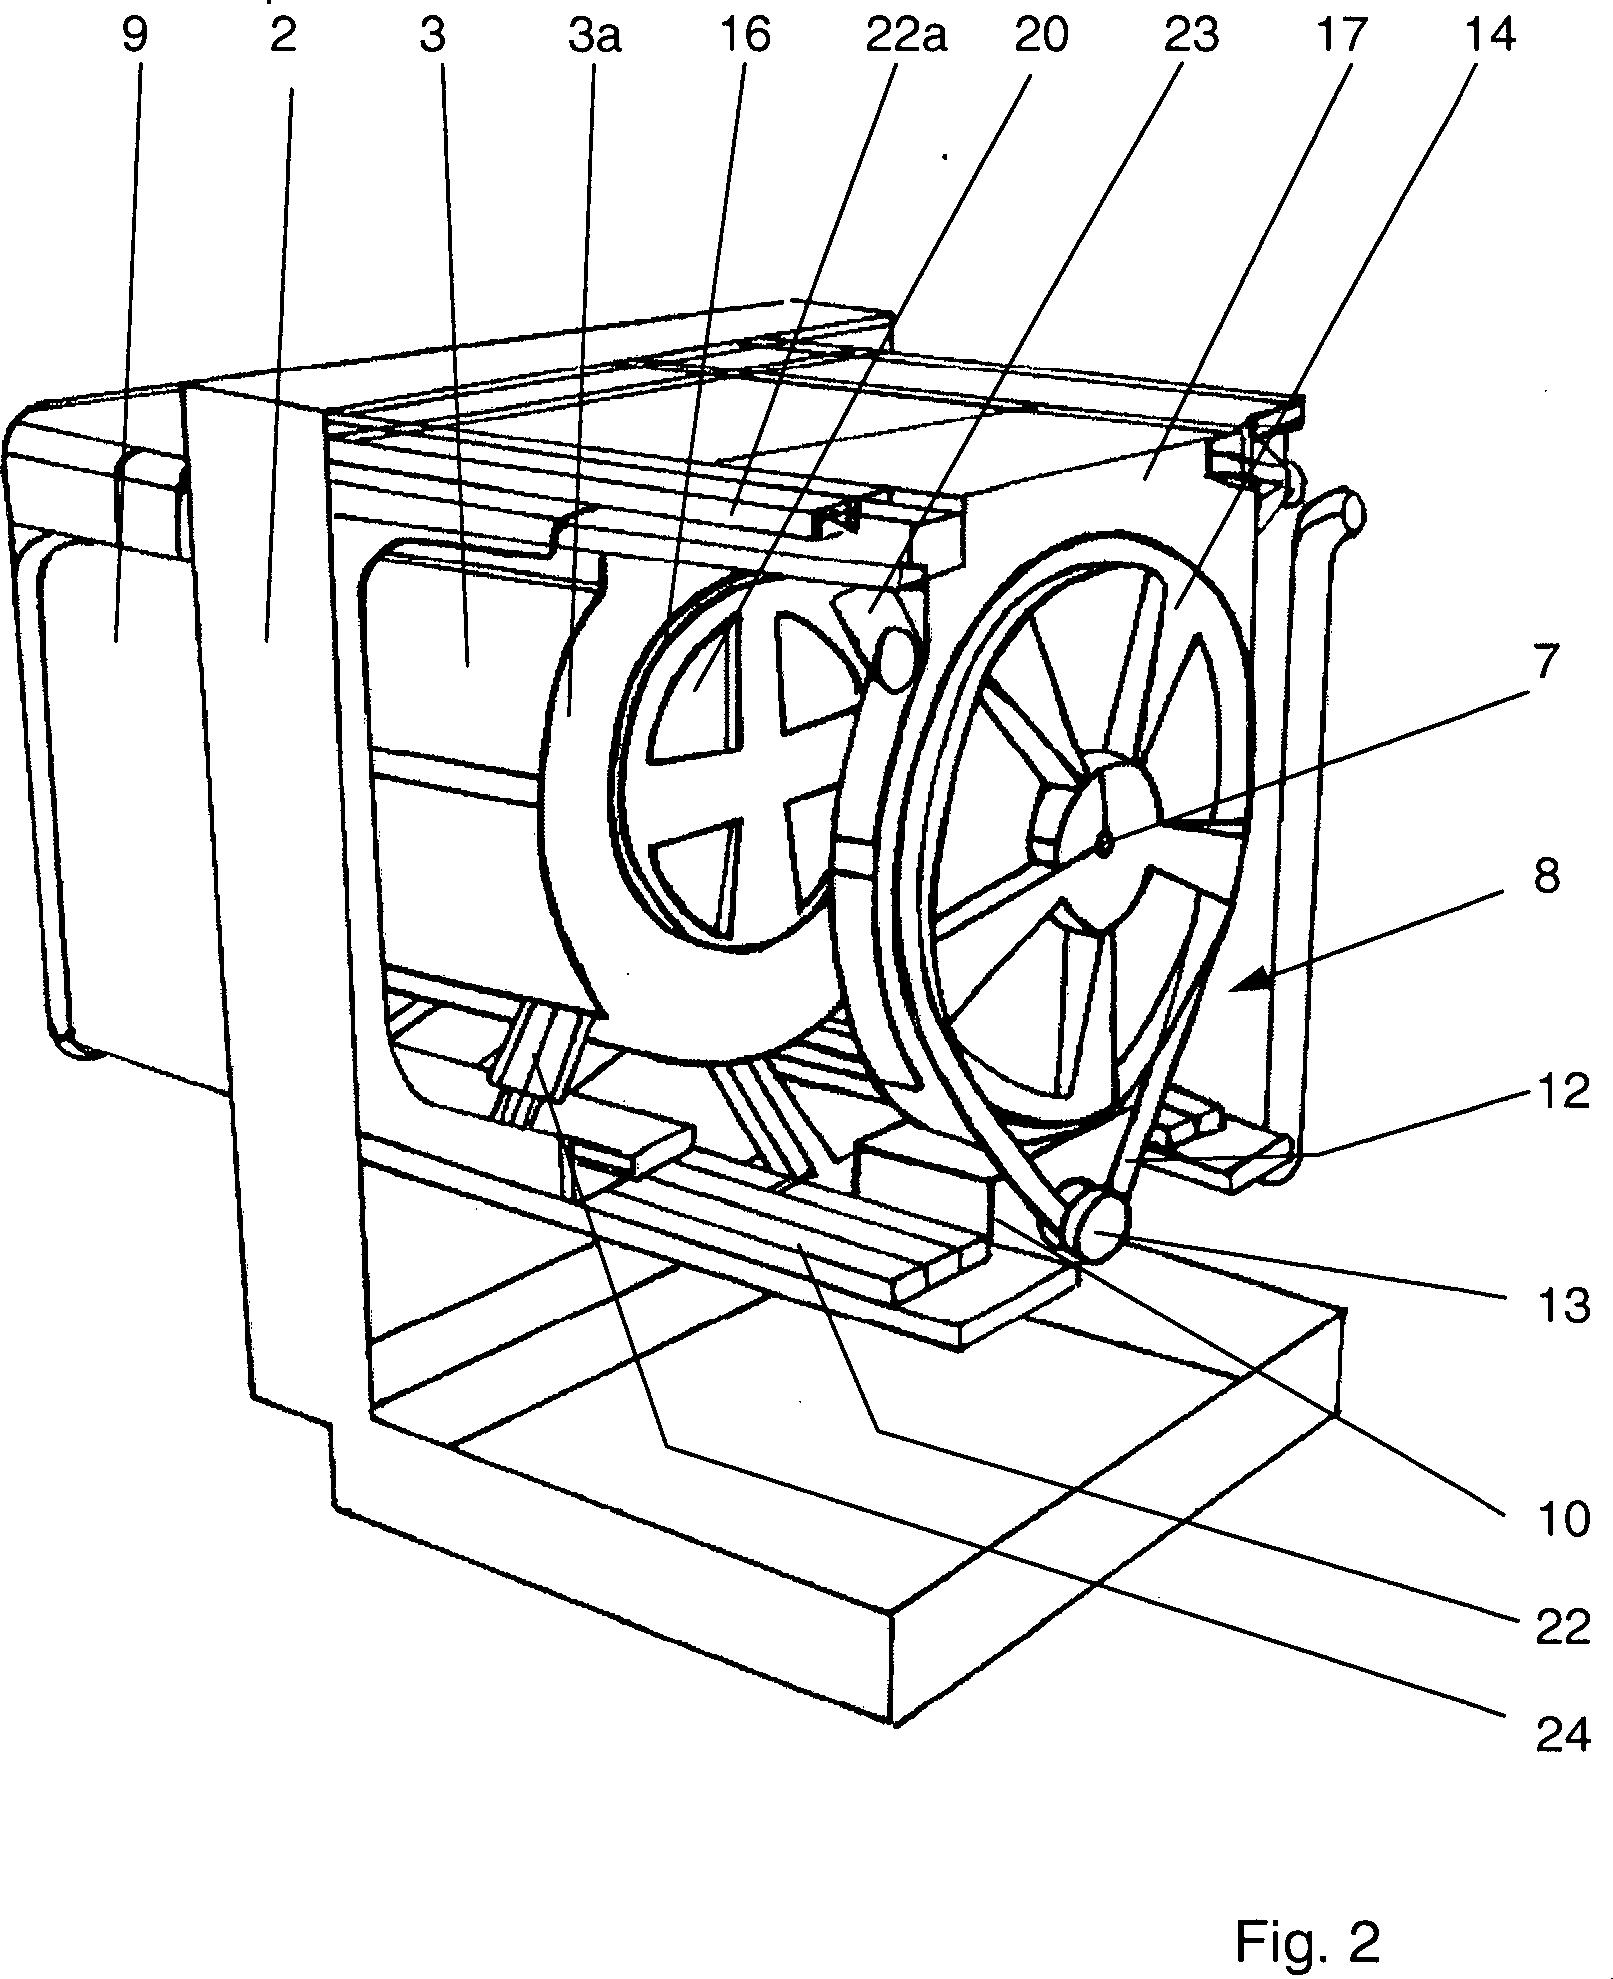 patent de102008009791b4 mantelbeschickbare waschmaschine bzw toplader waschmaschine google. Black Bedroom Furniture Sets. Home Design Ideas